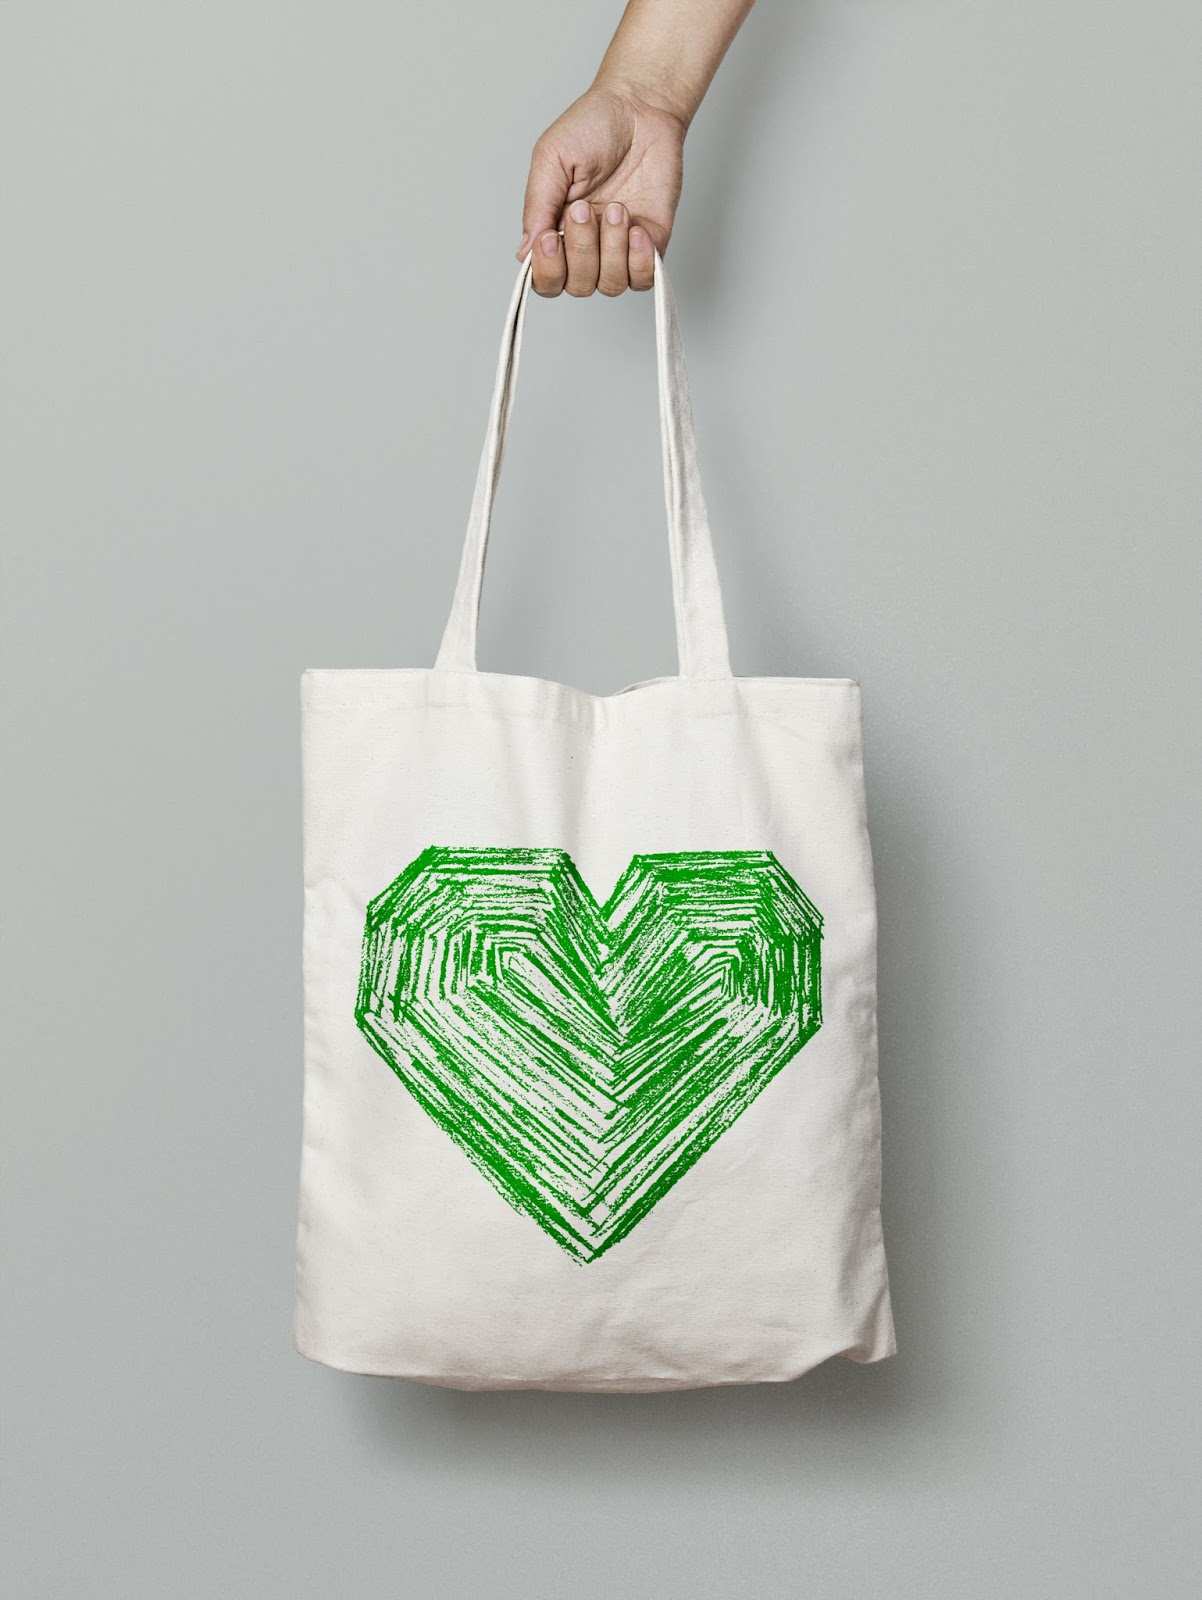 Byob Bring Your Own Bag